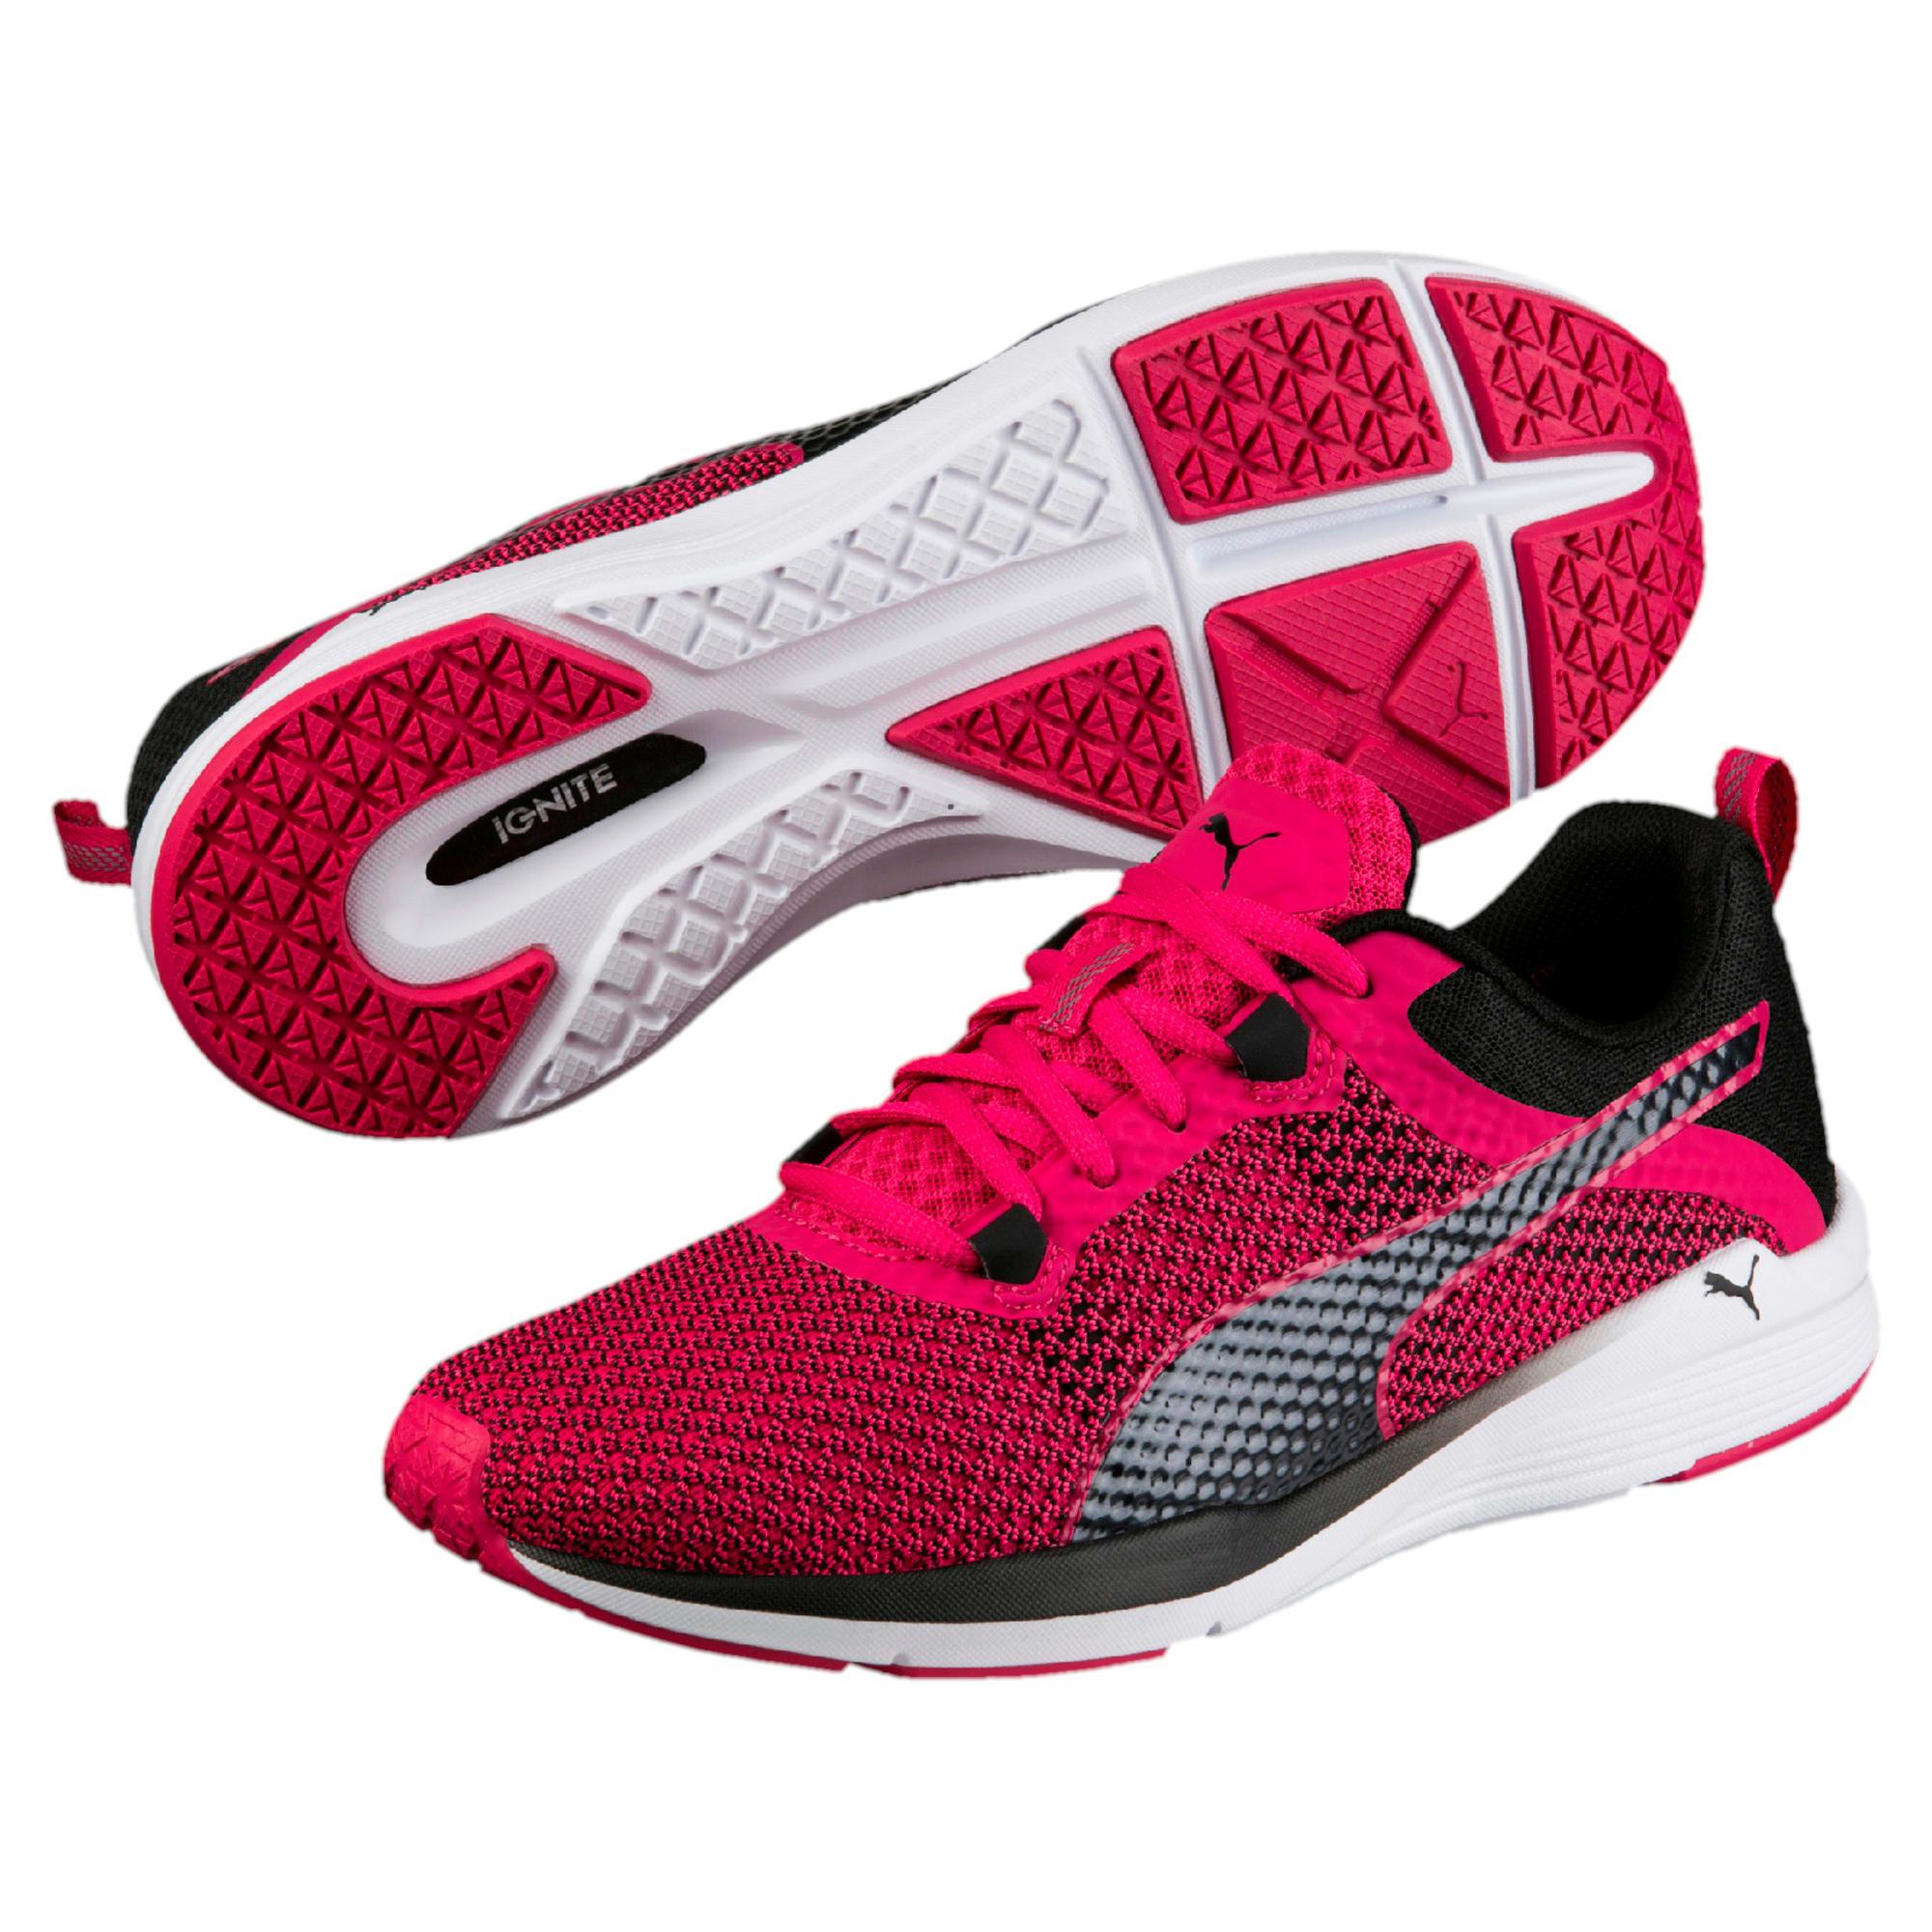 Thumbnail 6 of Pulse IGNITE XT Women's Training Shoes, Love Potion-Puma Black, medium-IND